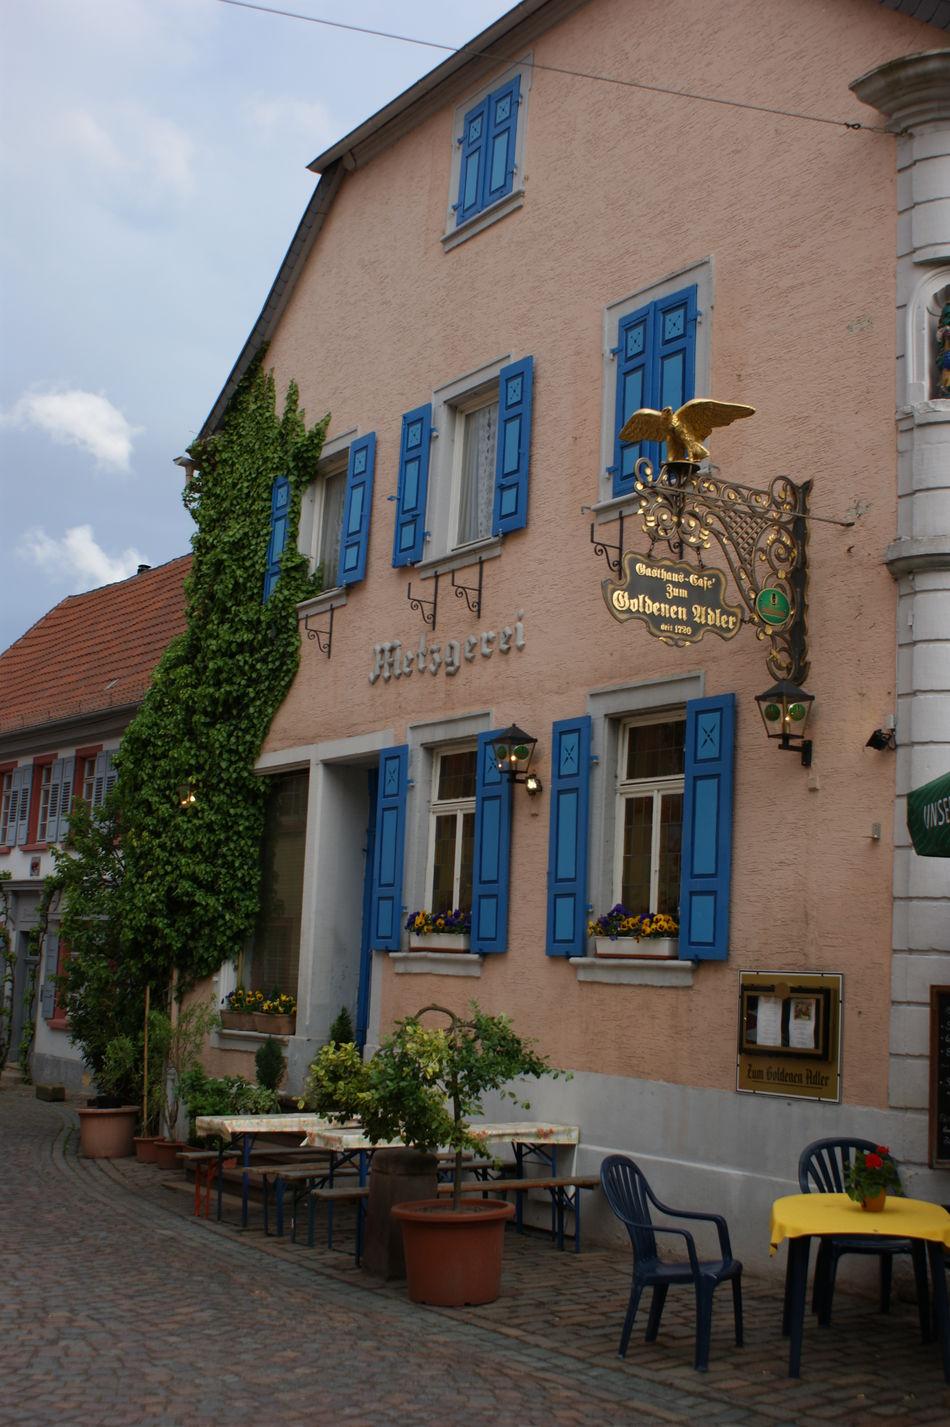 Architecture Blue Shutters Cobblestone Streets German Guest House German Restaurant German Village Guest House Restaurant